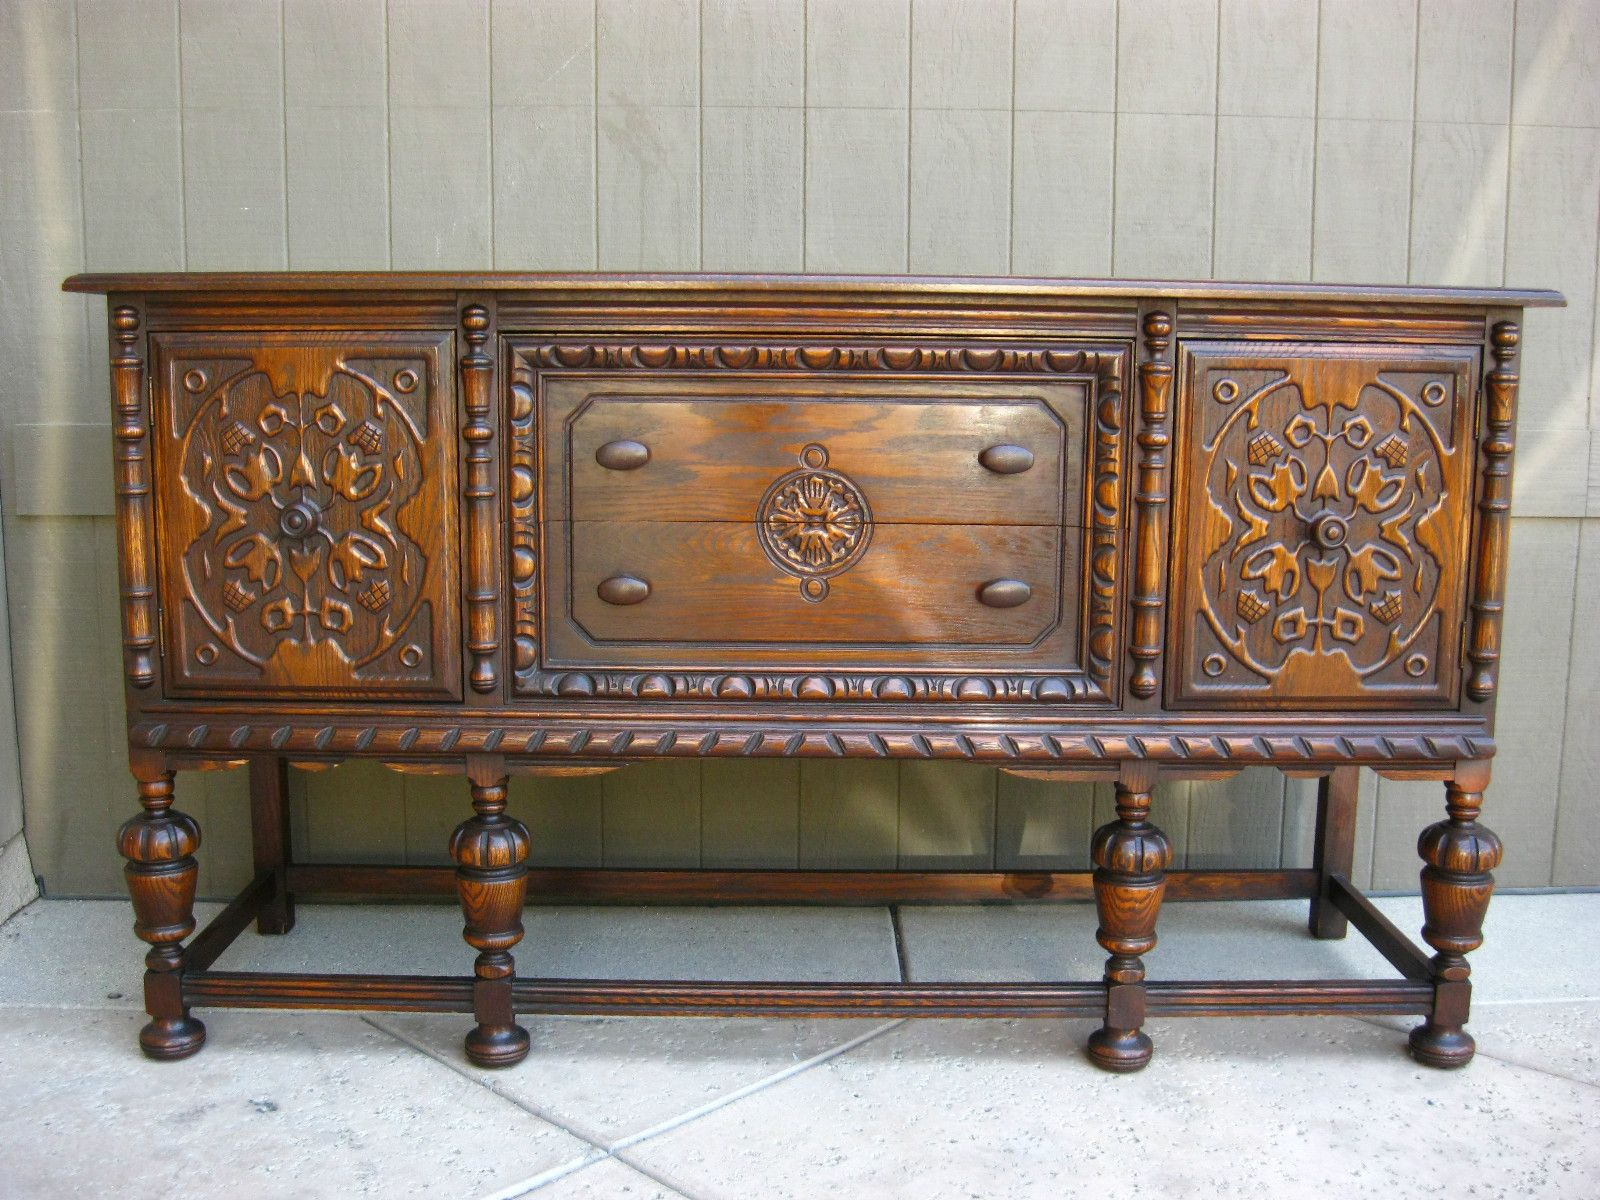 Vintage Spanish Revival BUFFET Gorgeous Renaissance Carved Sideboard  Credenza | EBay